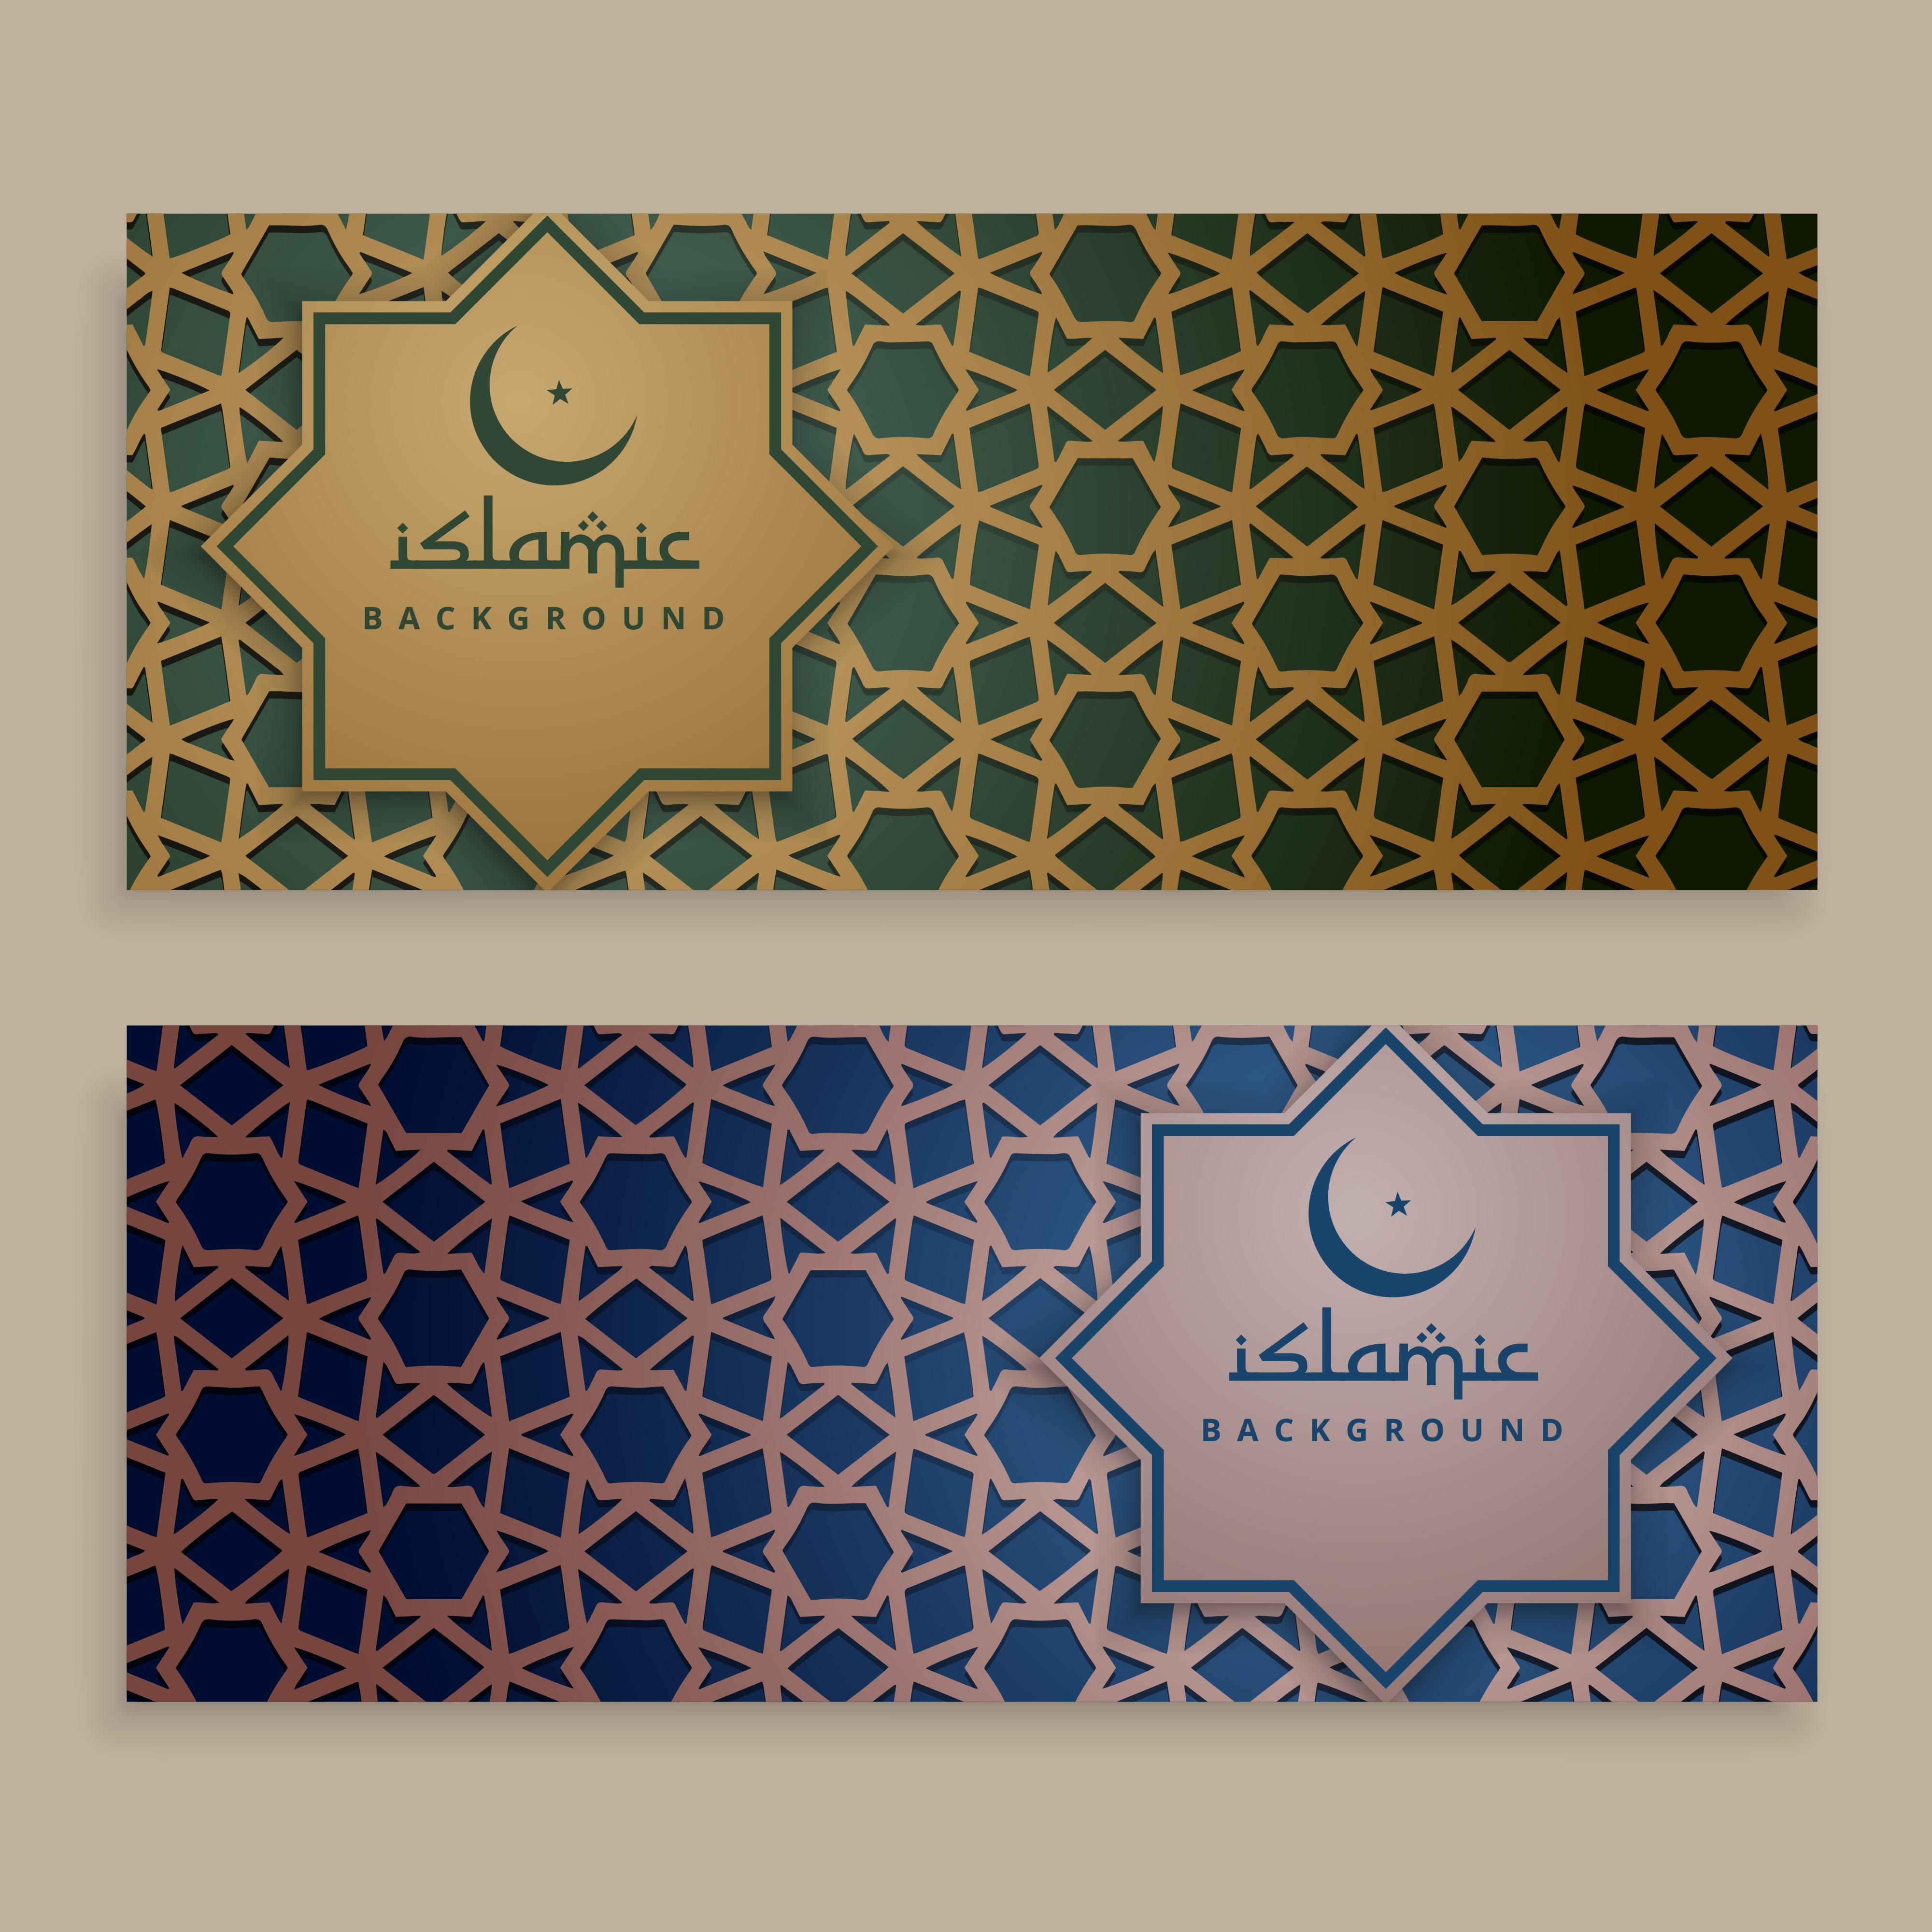 Islamic Banner Free Vector Art 14858 Downloads Desain Islami